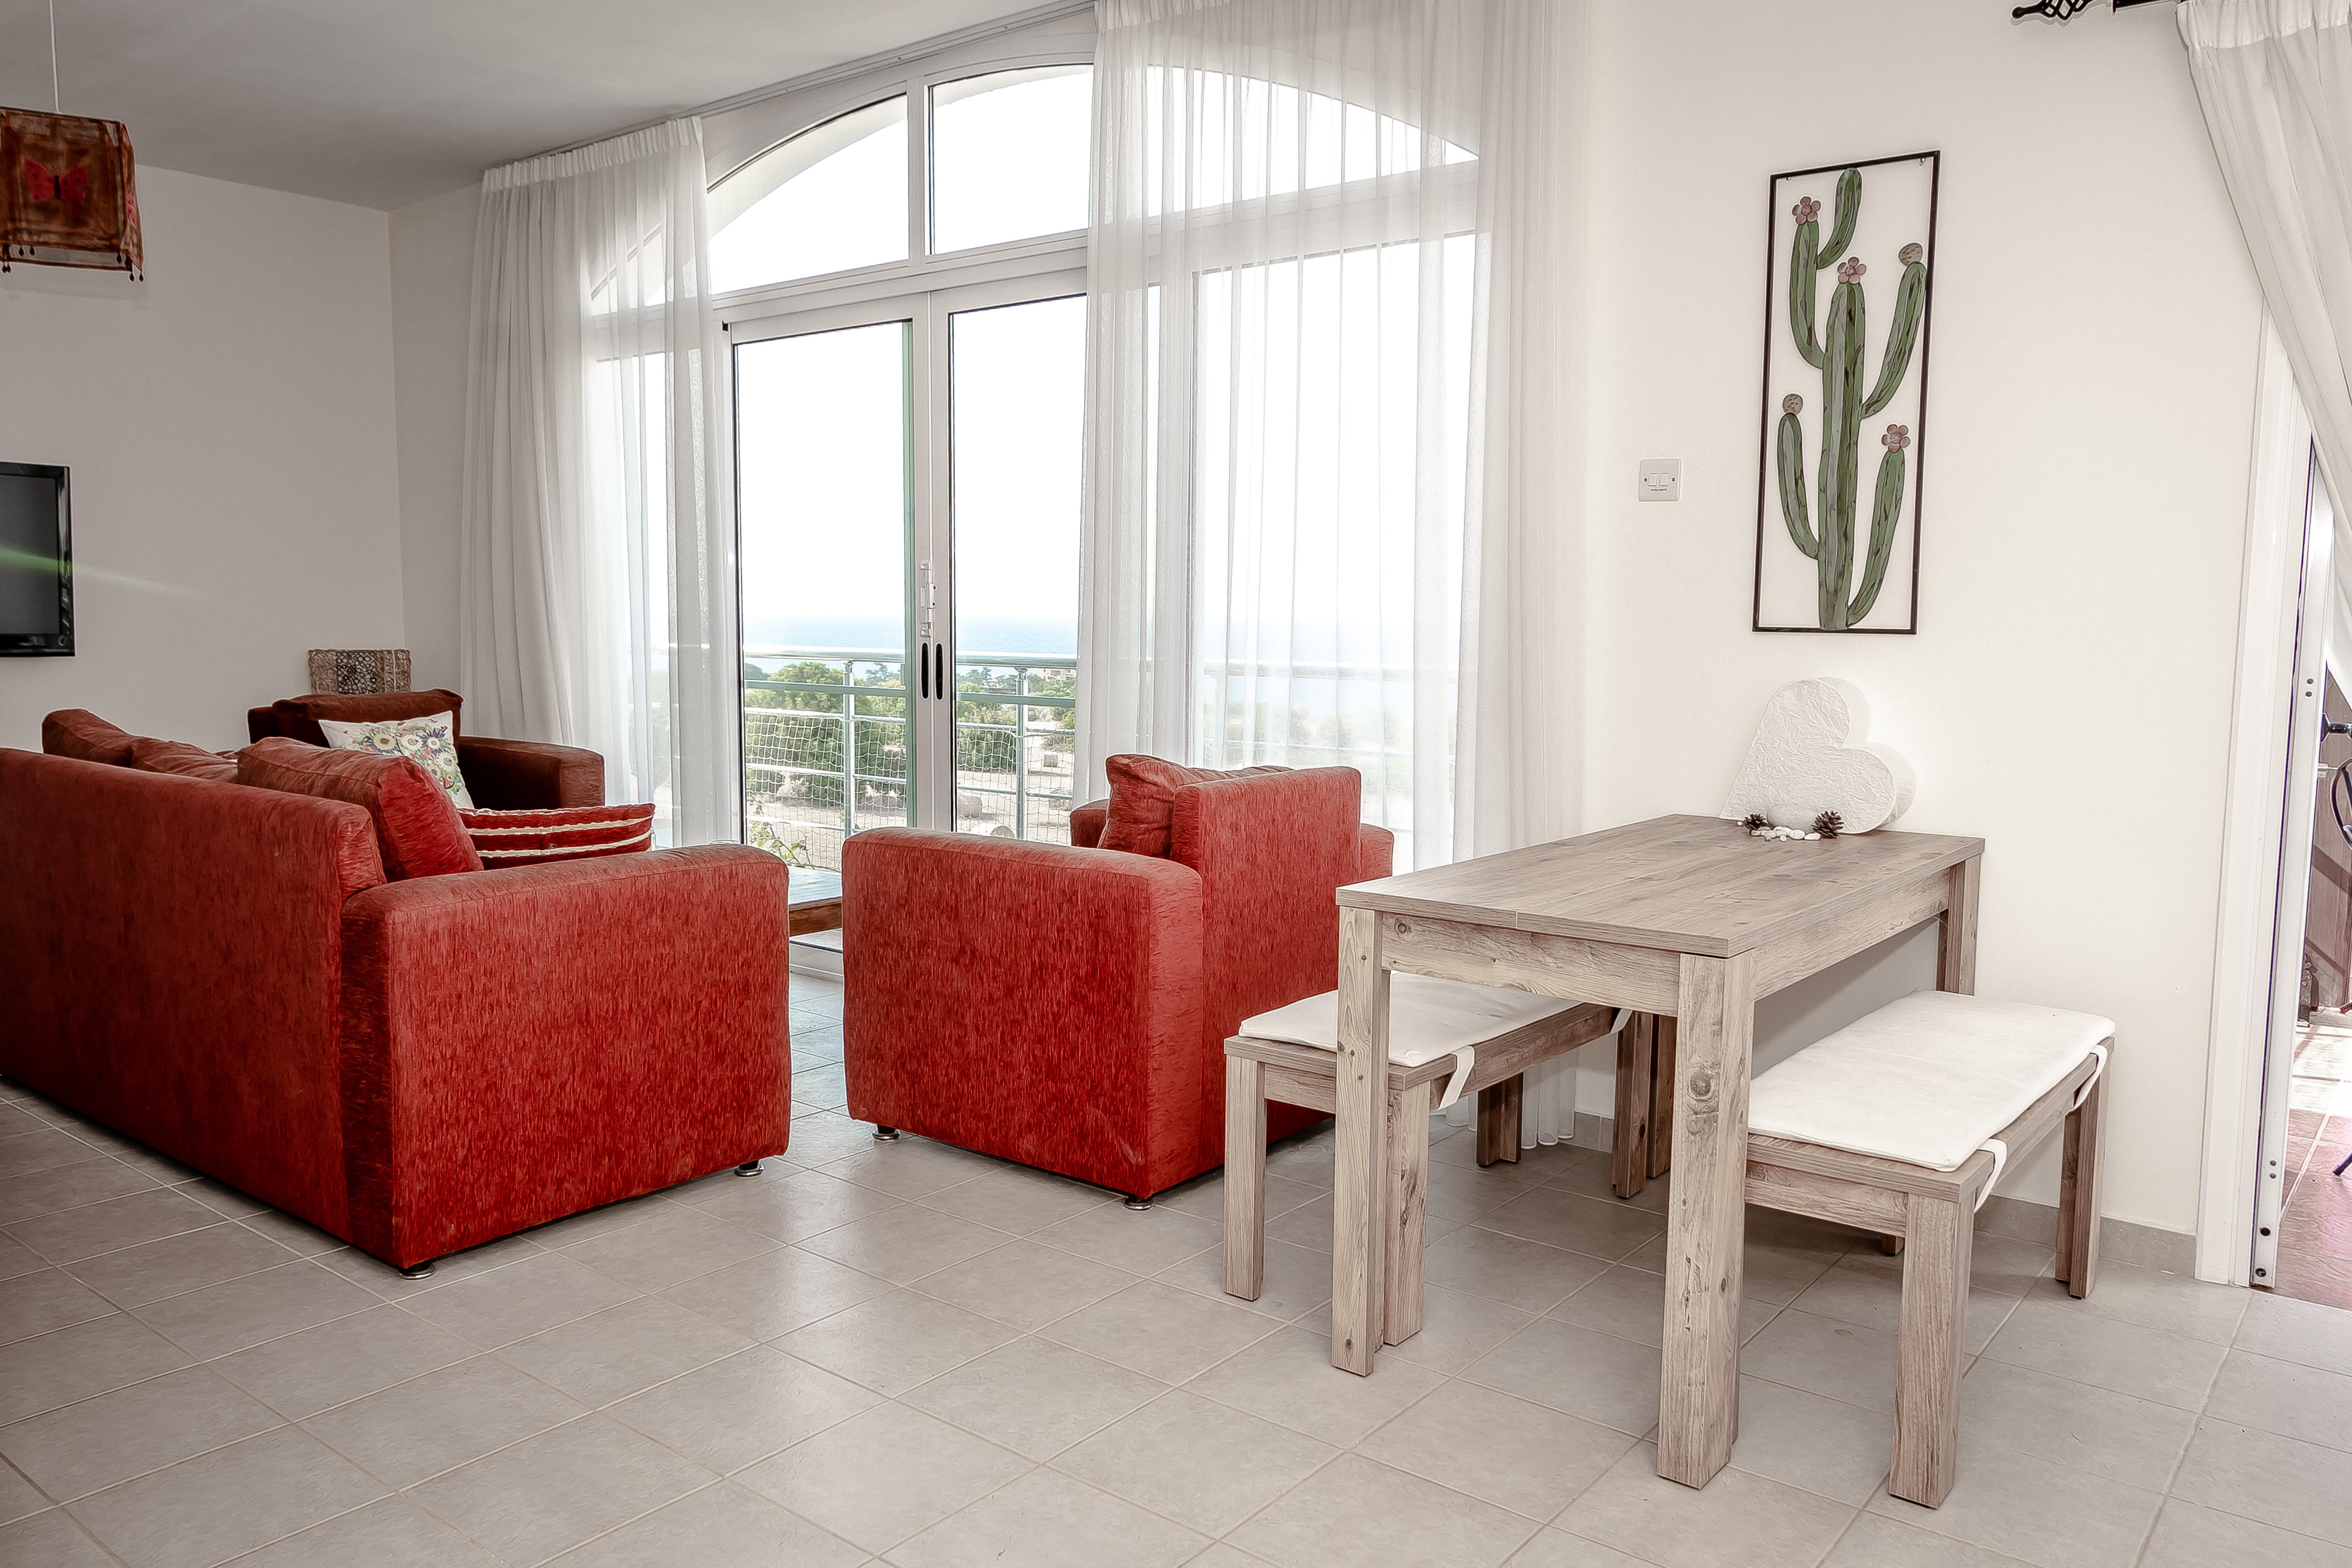 Joya Cyprus Manzara Penthouse Apartment photo 20273570